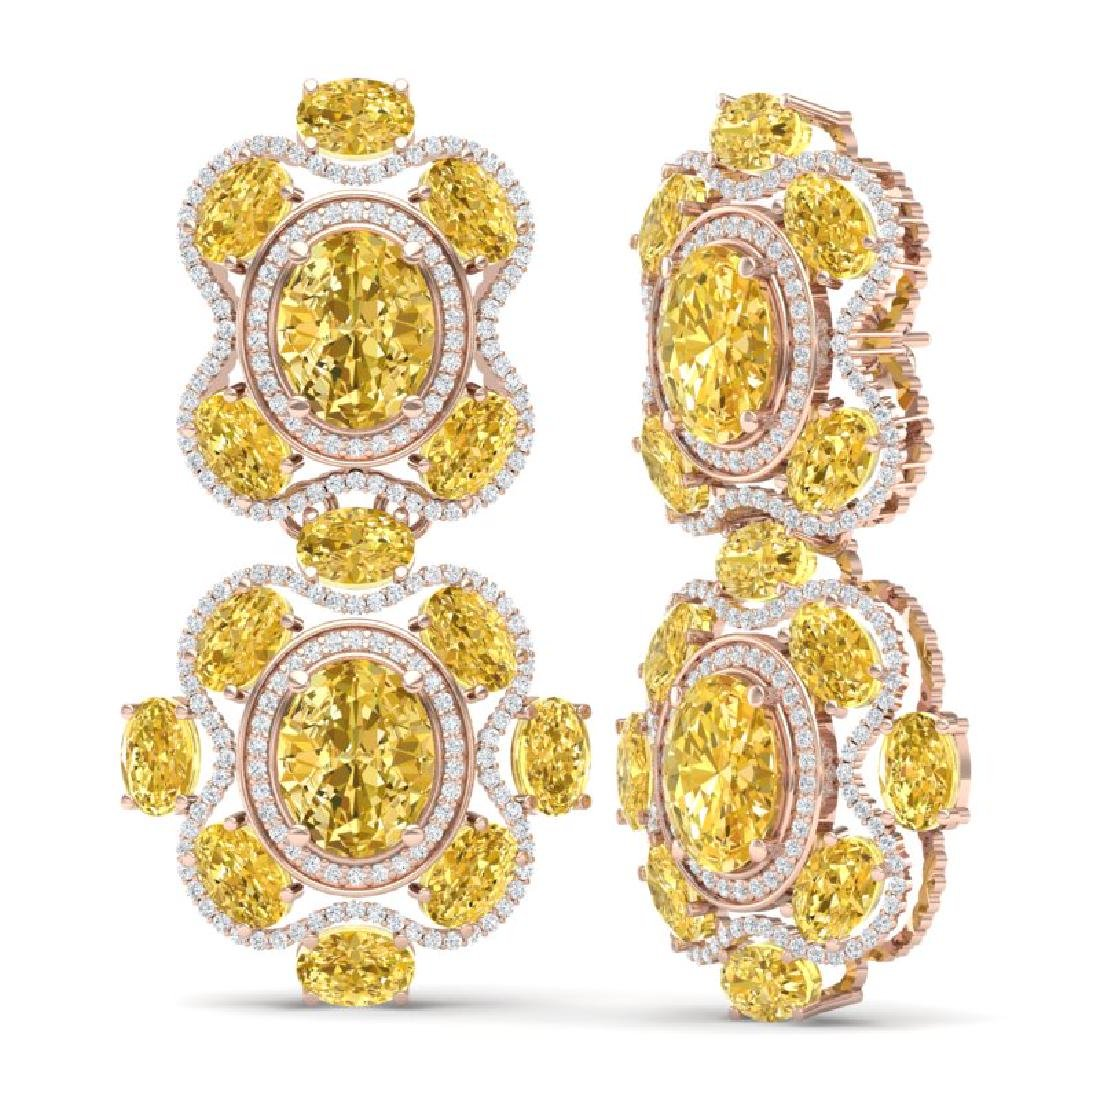 29.21 CTW Royalty Canary Citrine & VS Diamond Earrings - 3